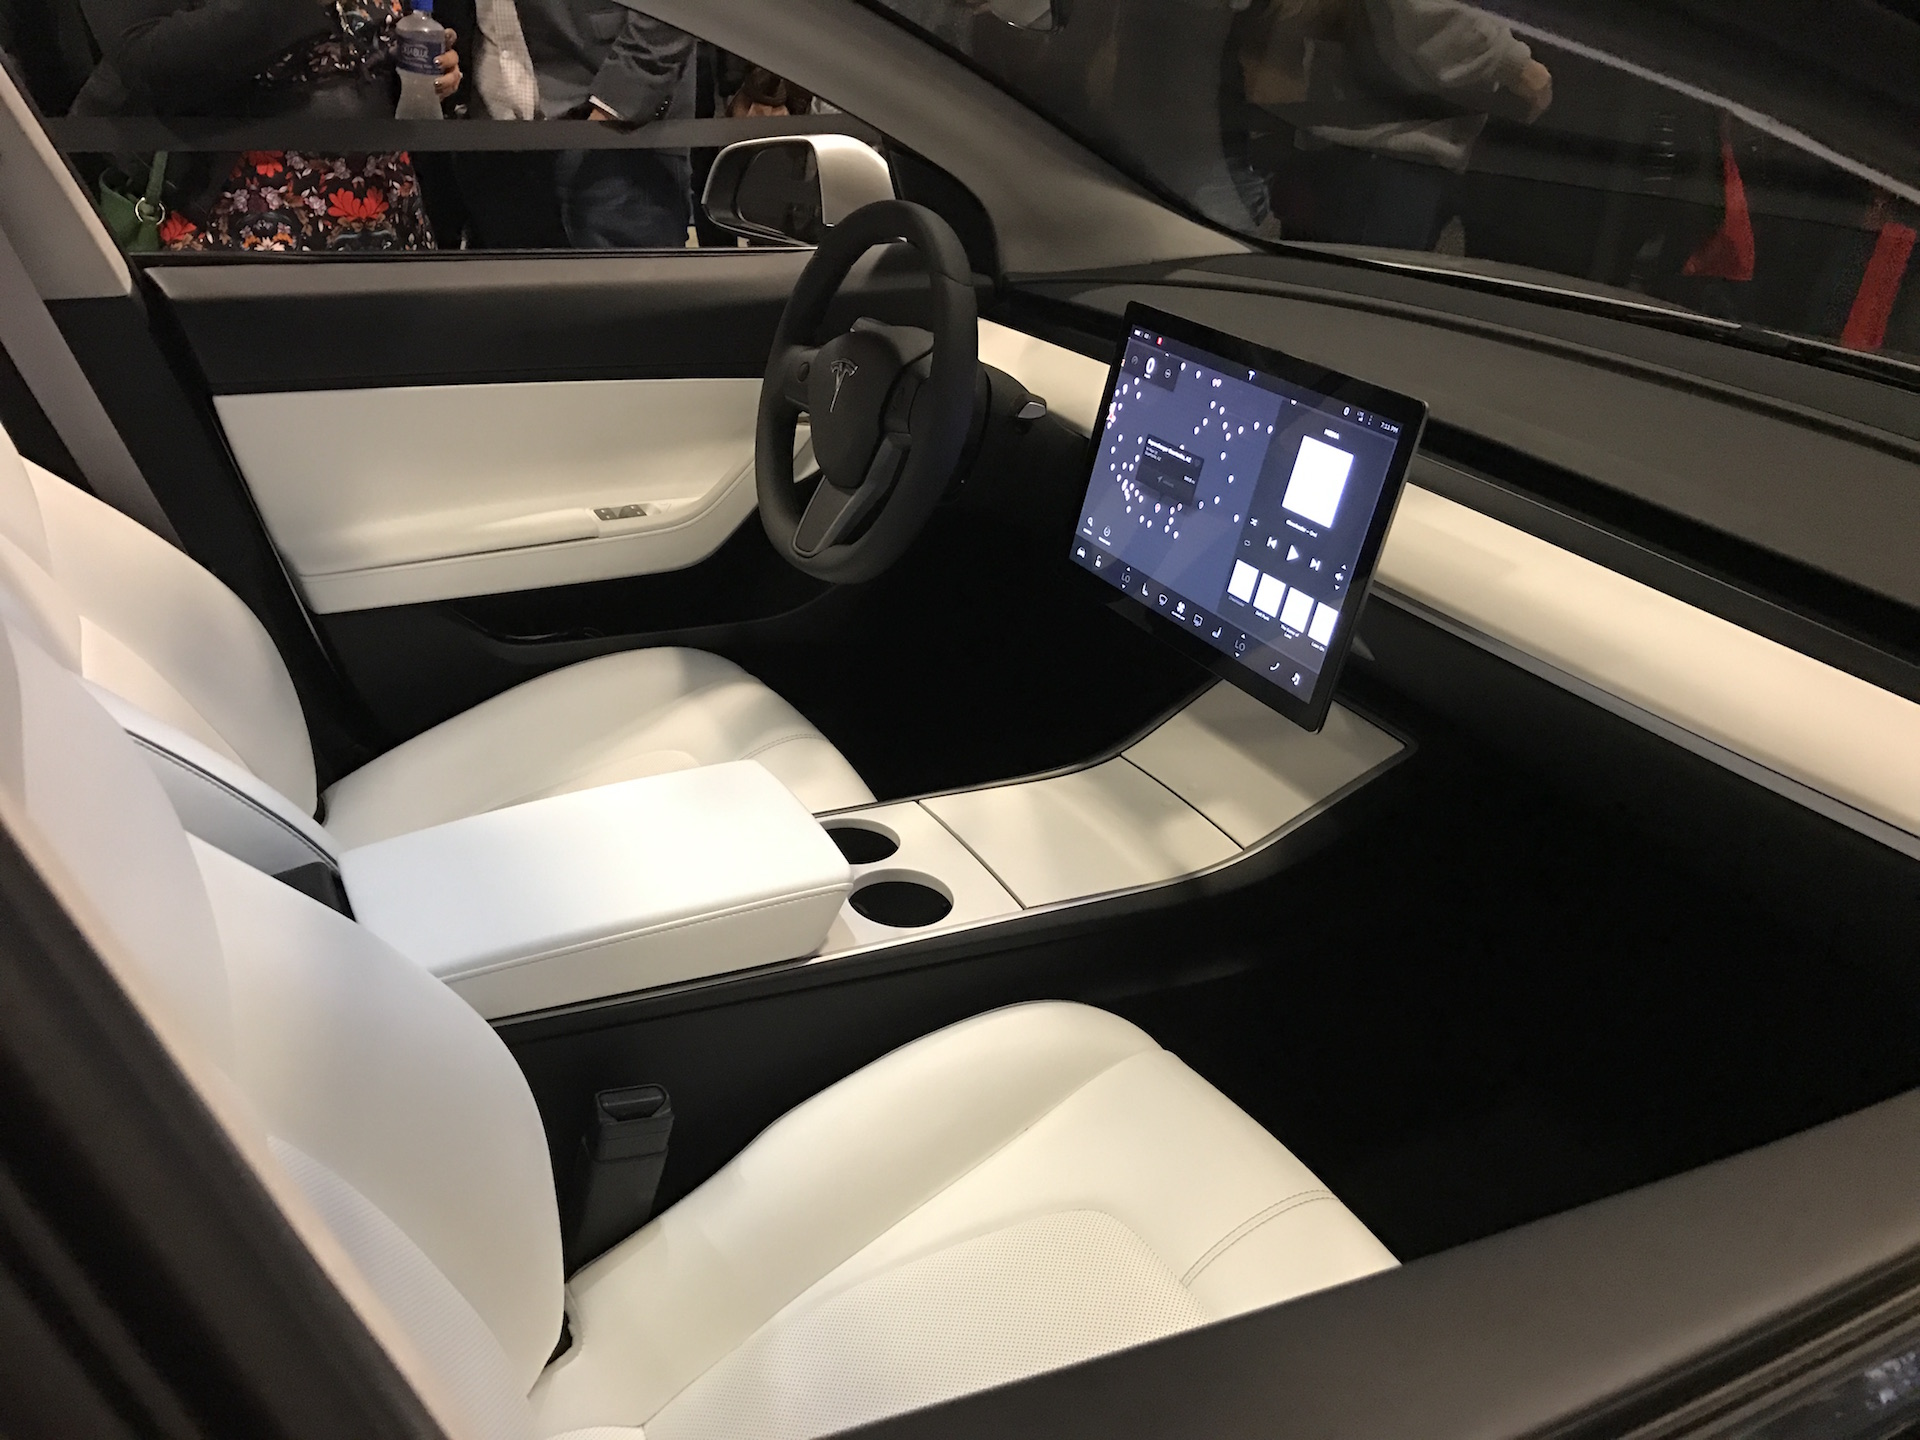 Silver Tesla Model 3 interior center wheel at the Avaya Stadium [Credit: ryaneager via imgur]